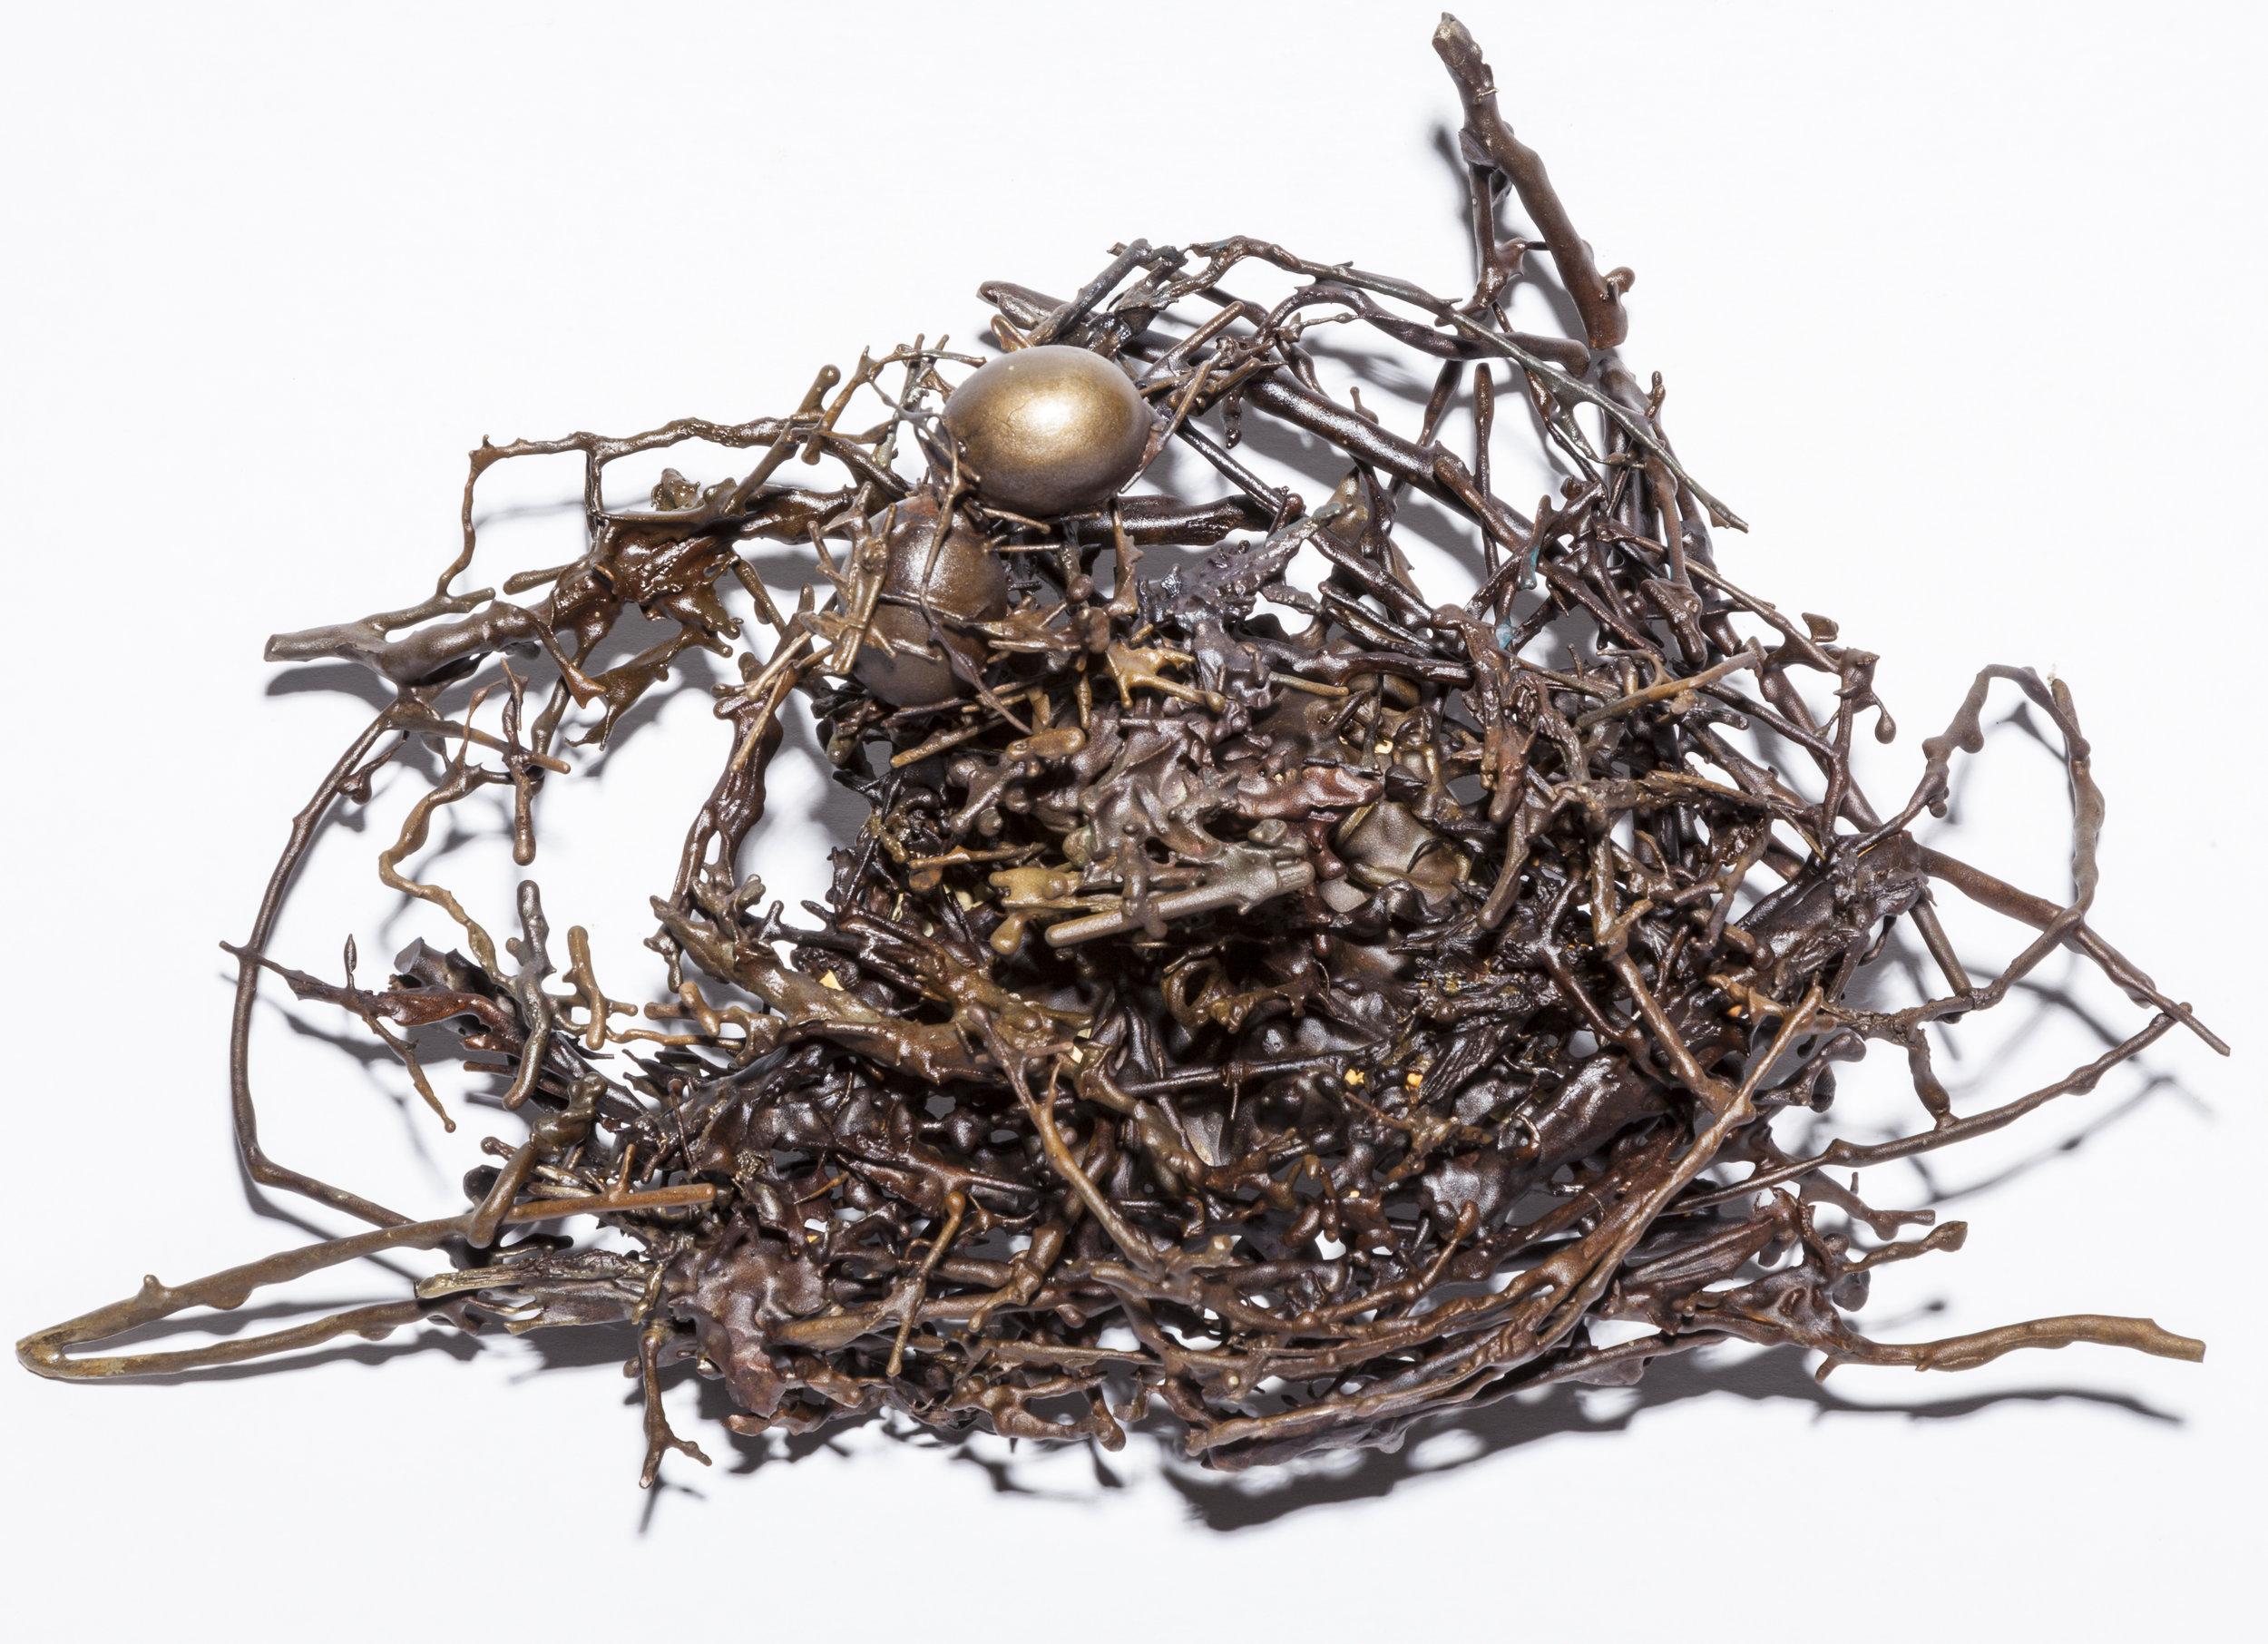 BaleCreekAllen Nests-001.jpg